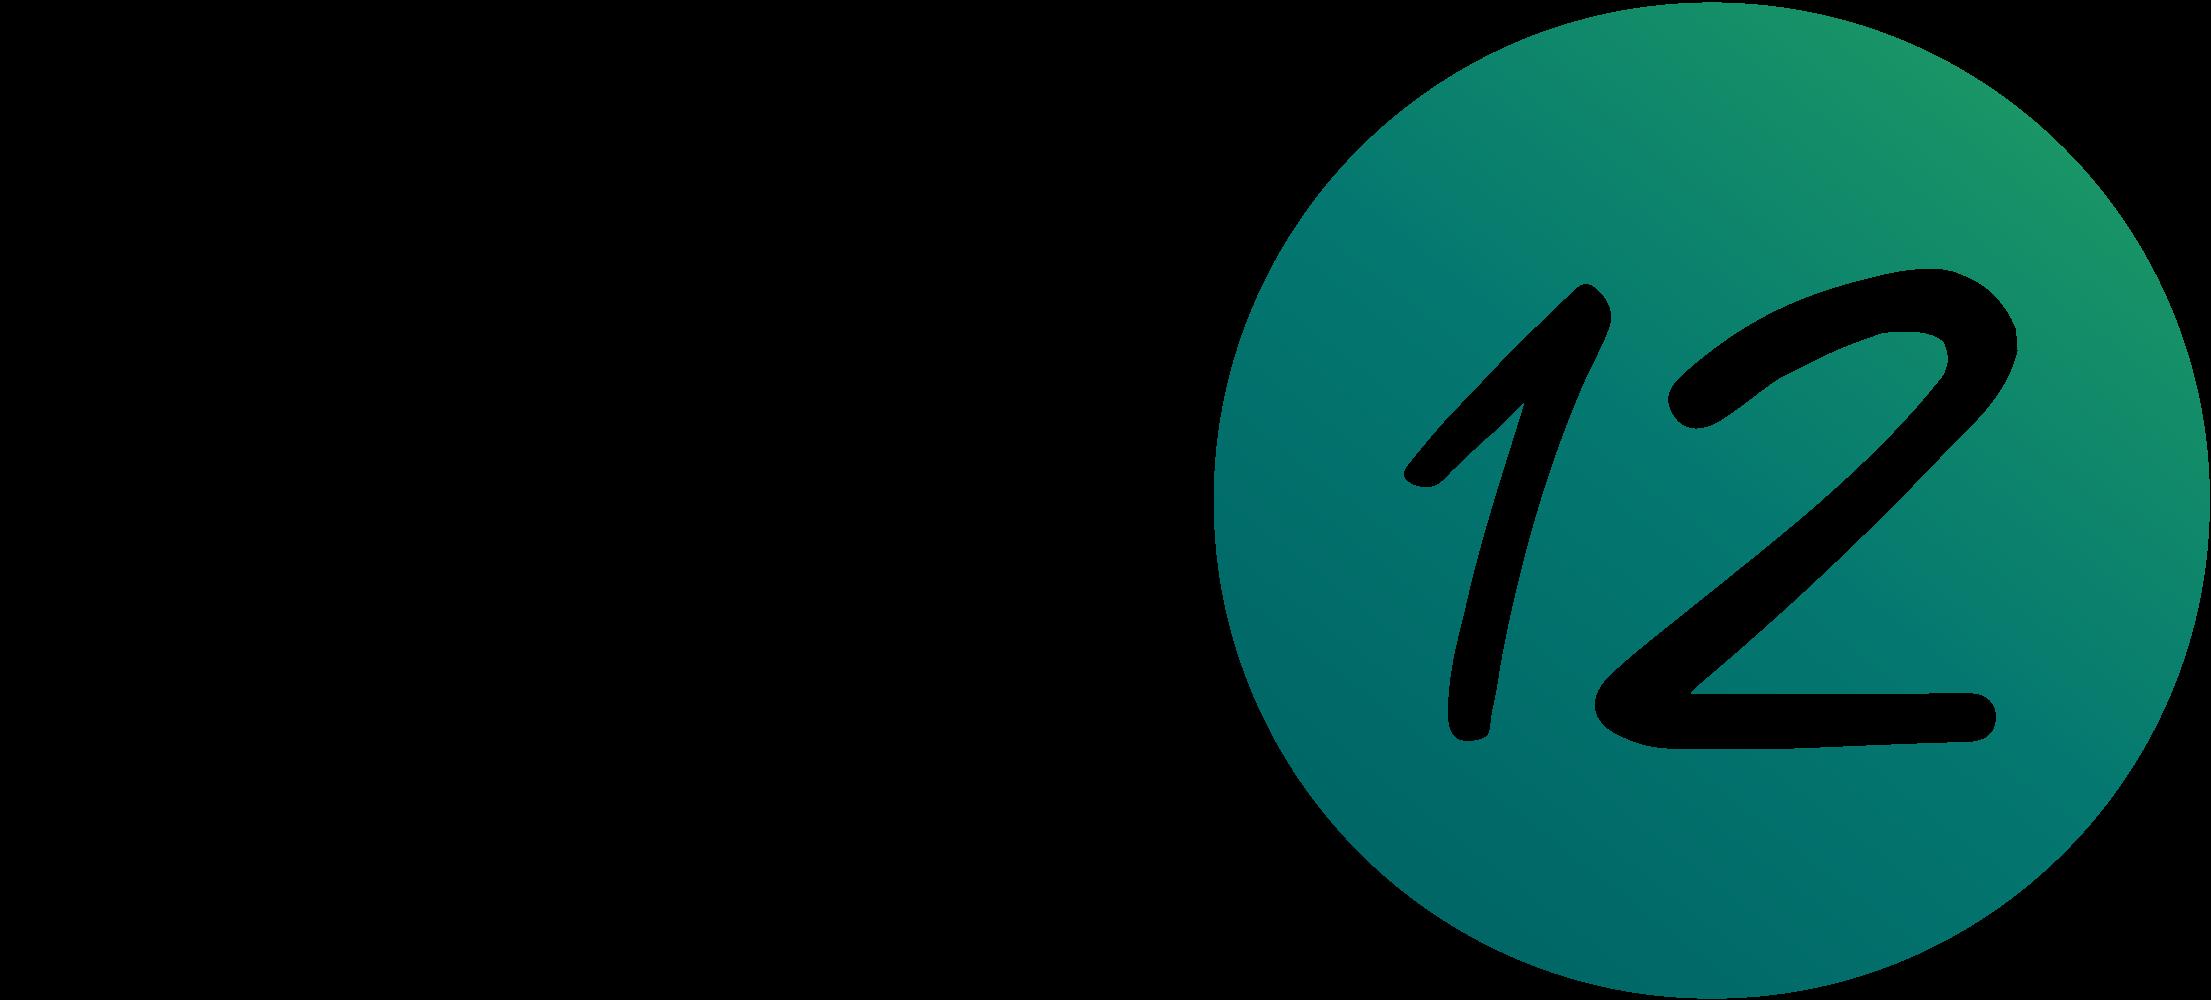 Fan12 Logo transparent